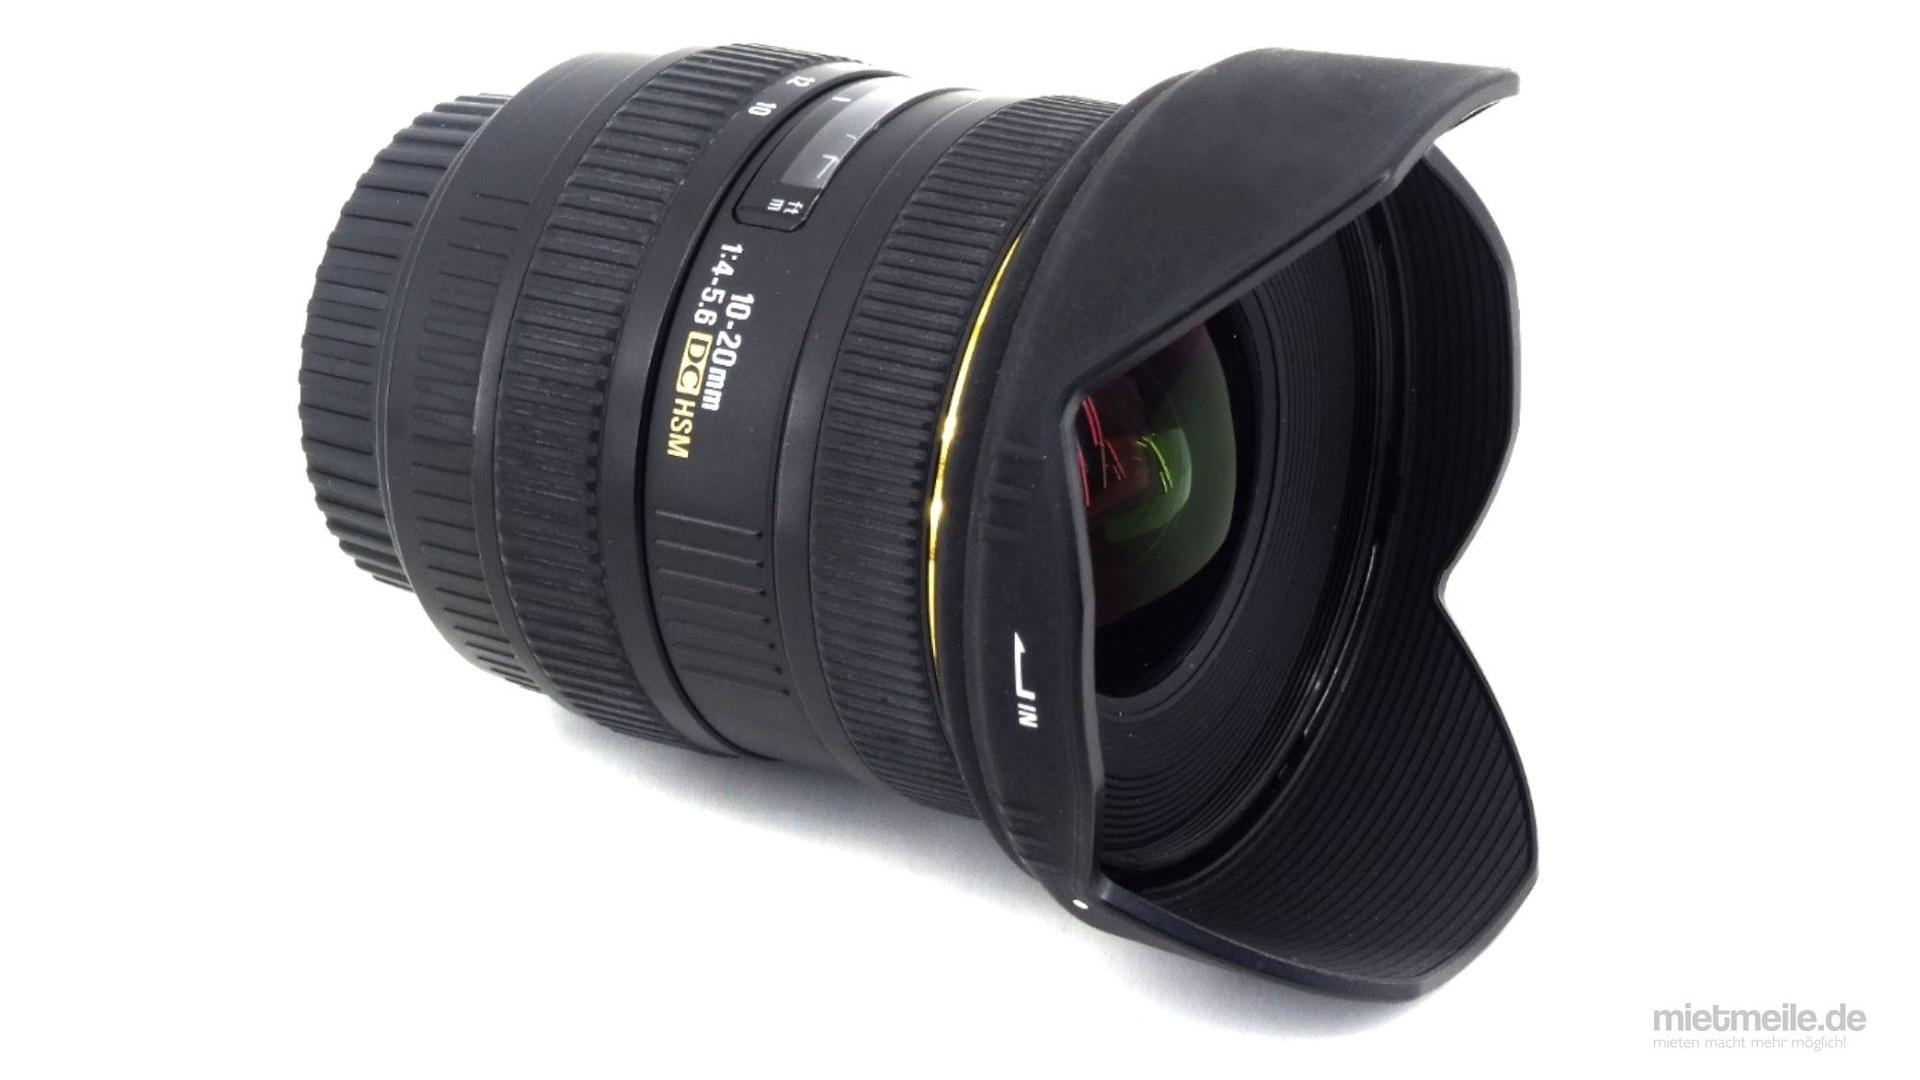 Objektive mieten & vermieten - Weitwinkel-Objektiv Sigma 10-20mm F/4-5,6 Nikon HSM in Schkeuditz